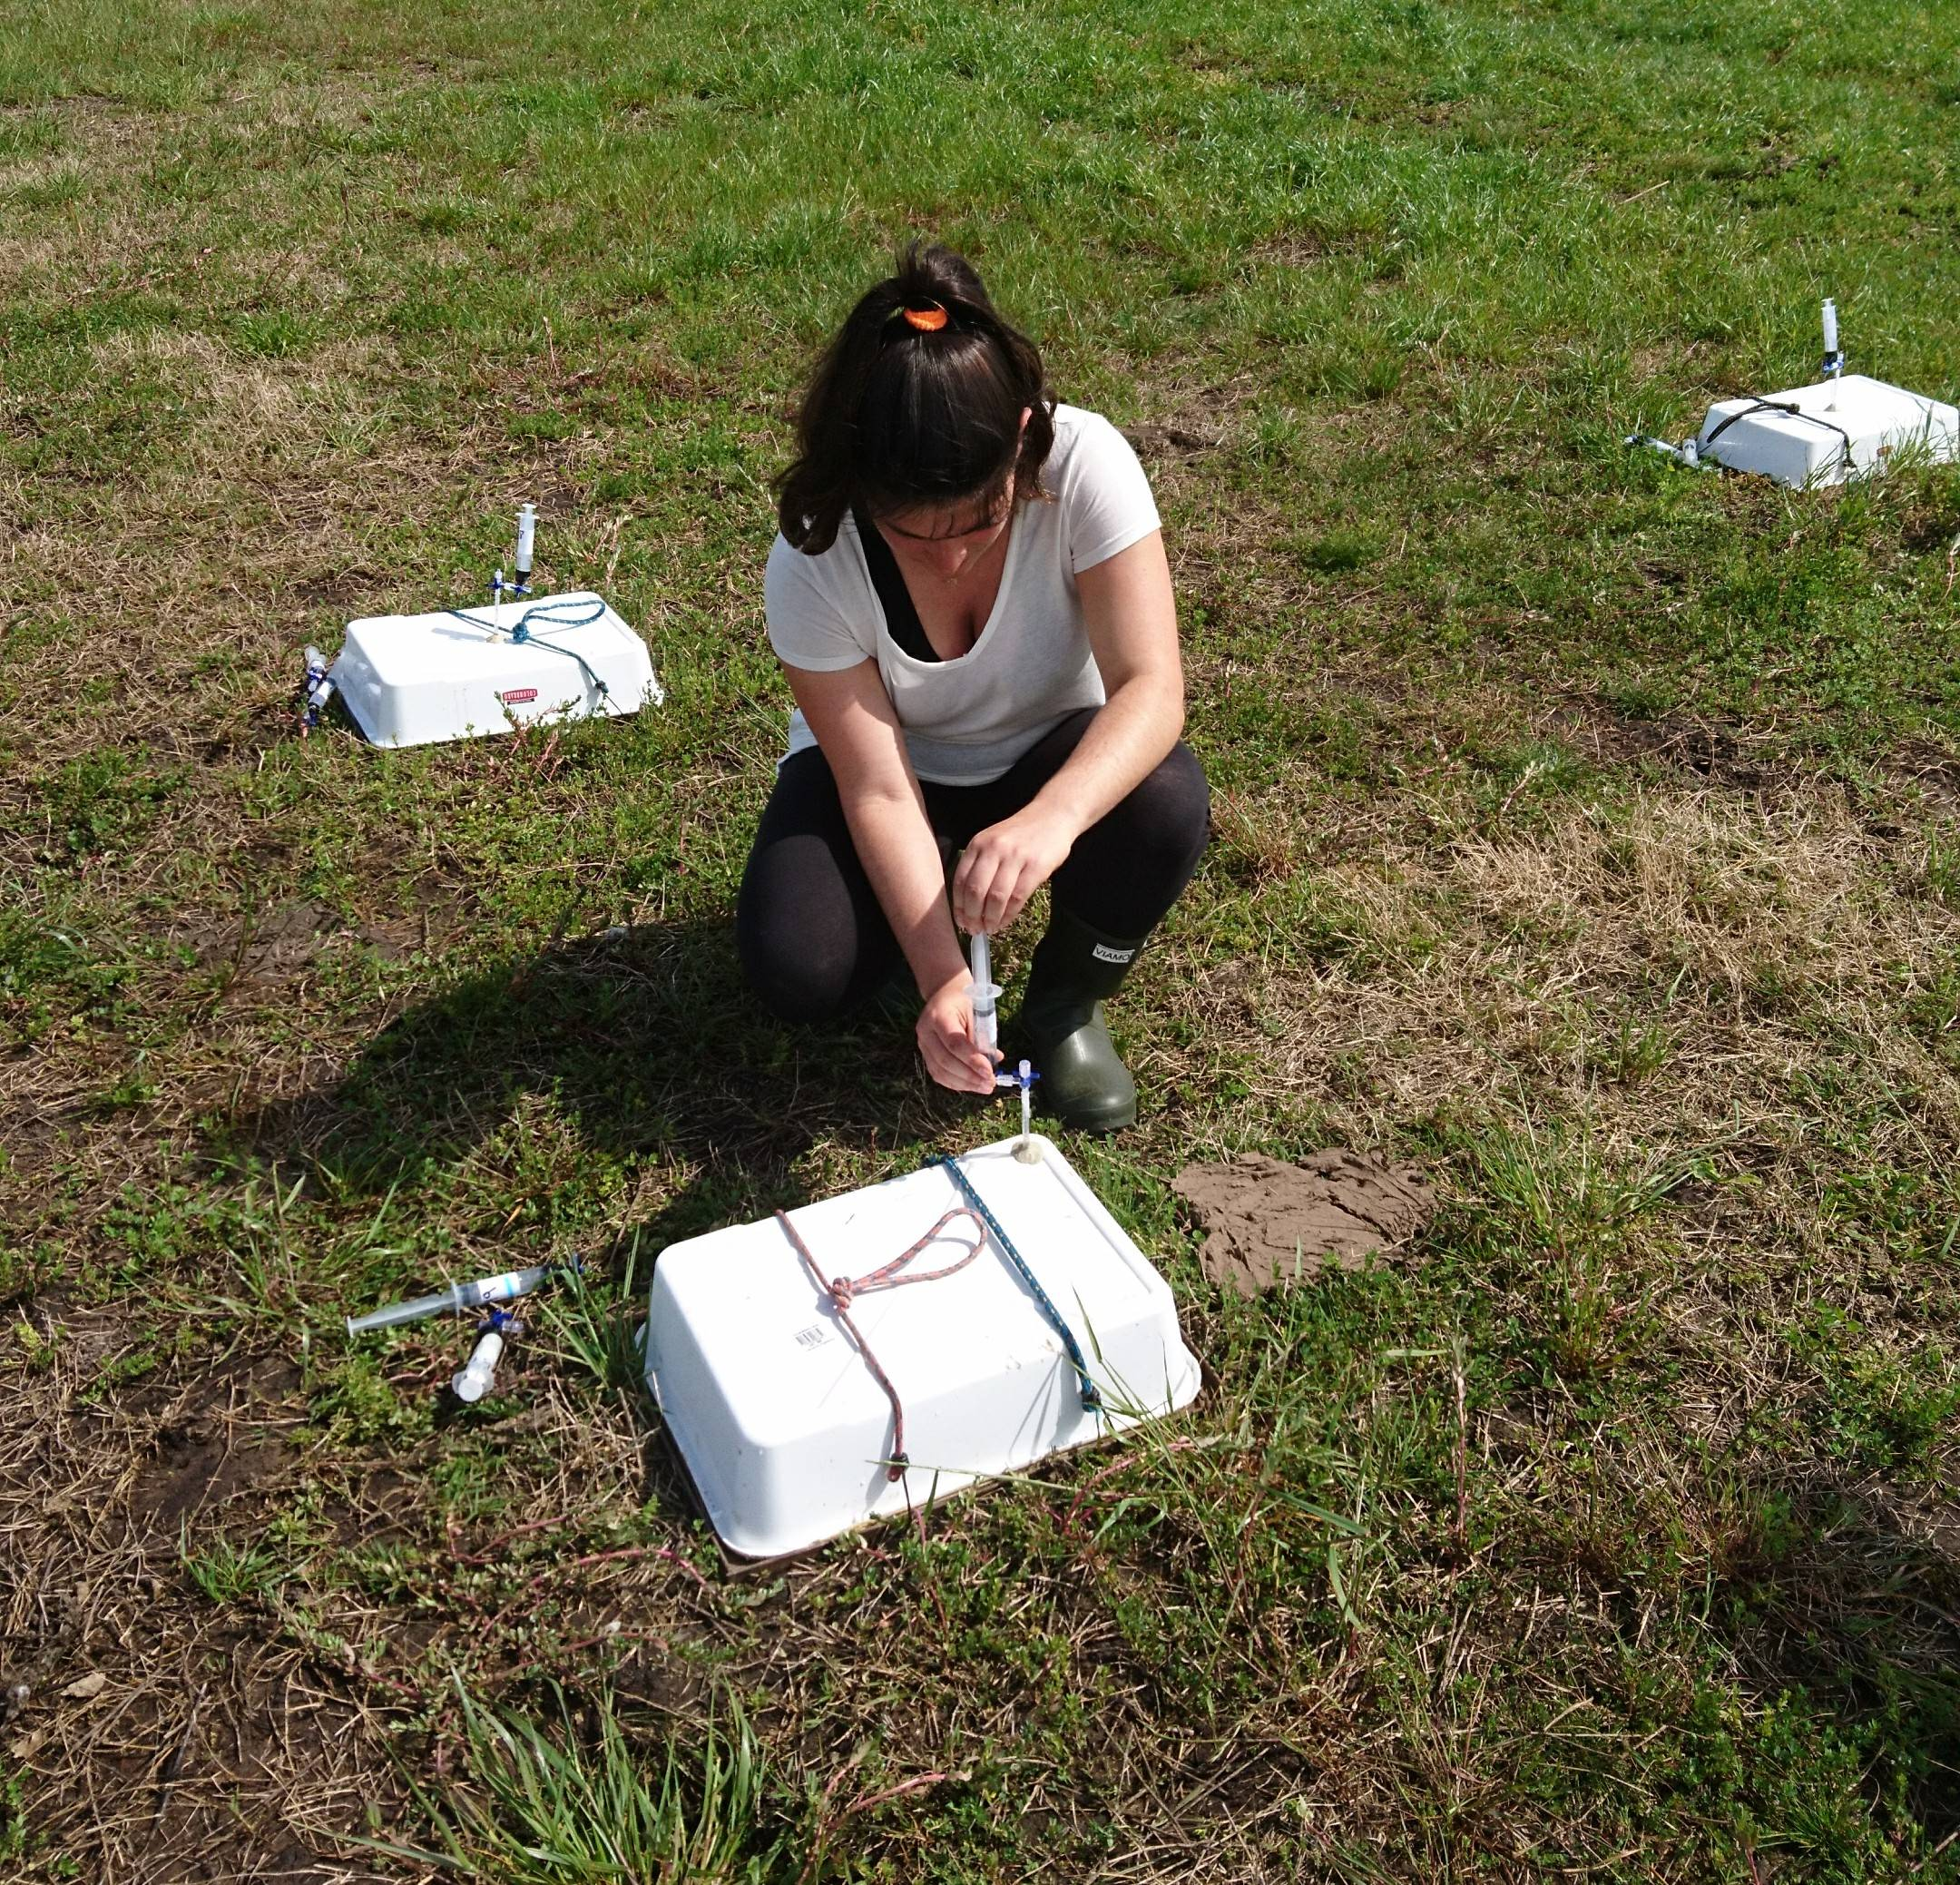 Muestreo de gases a campo. Foto: Daniela Regolo